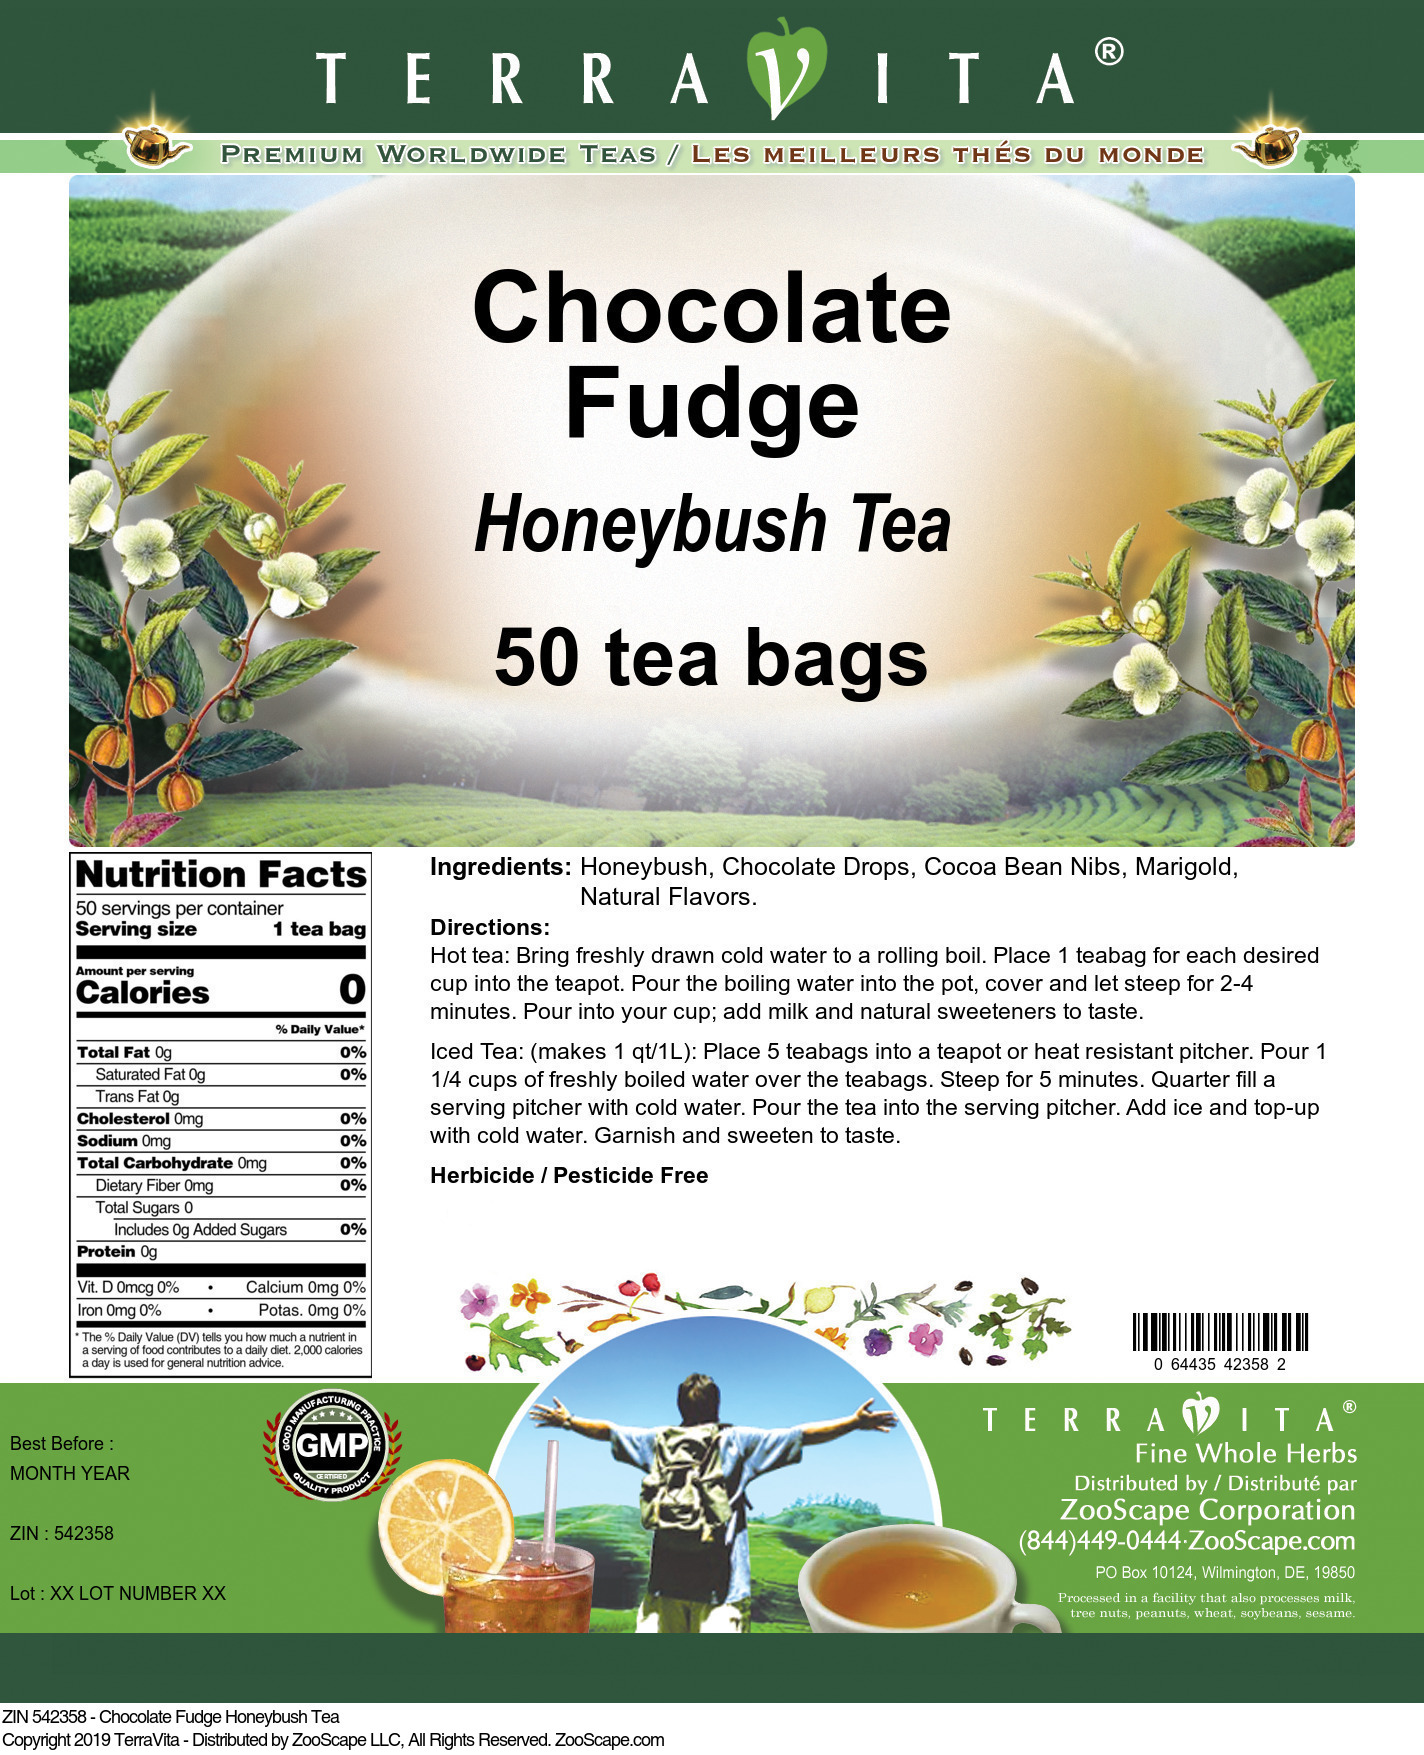 Chocolate Fudge Honeybush Tea